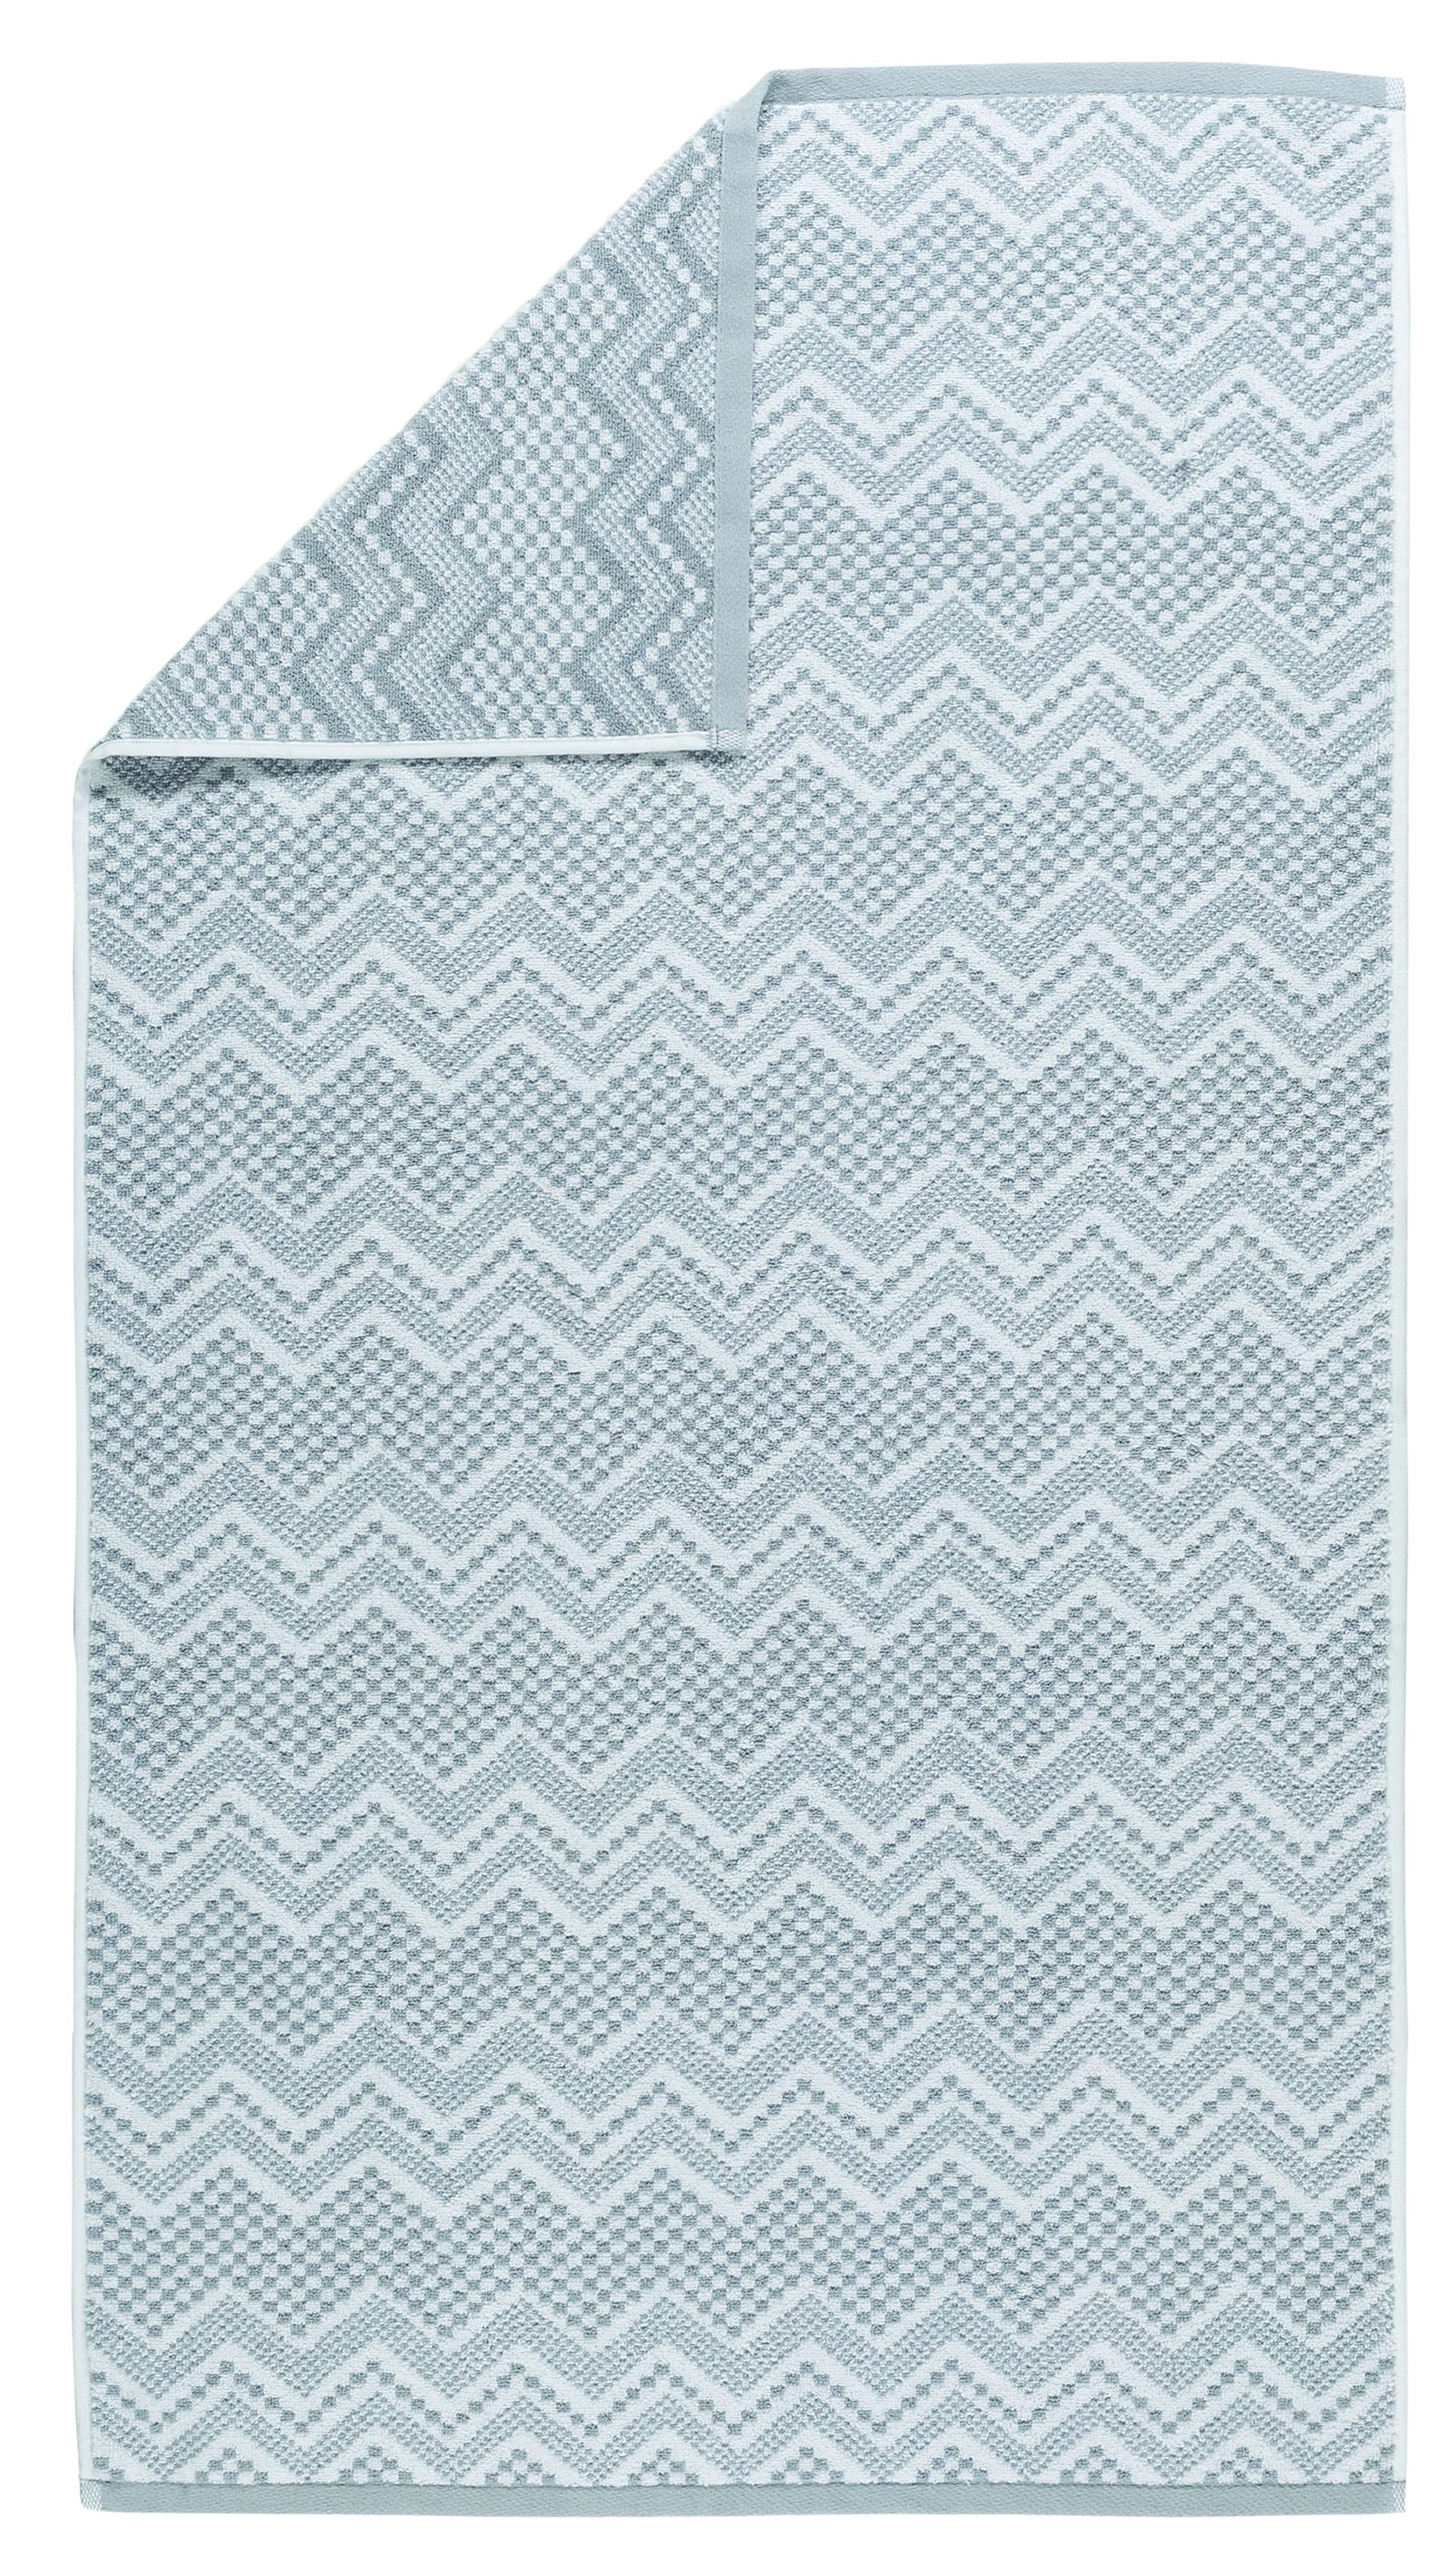 Sealskin Portofino handdoek 60x110 cm grijs